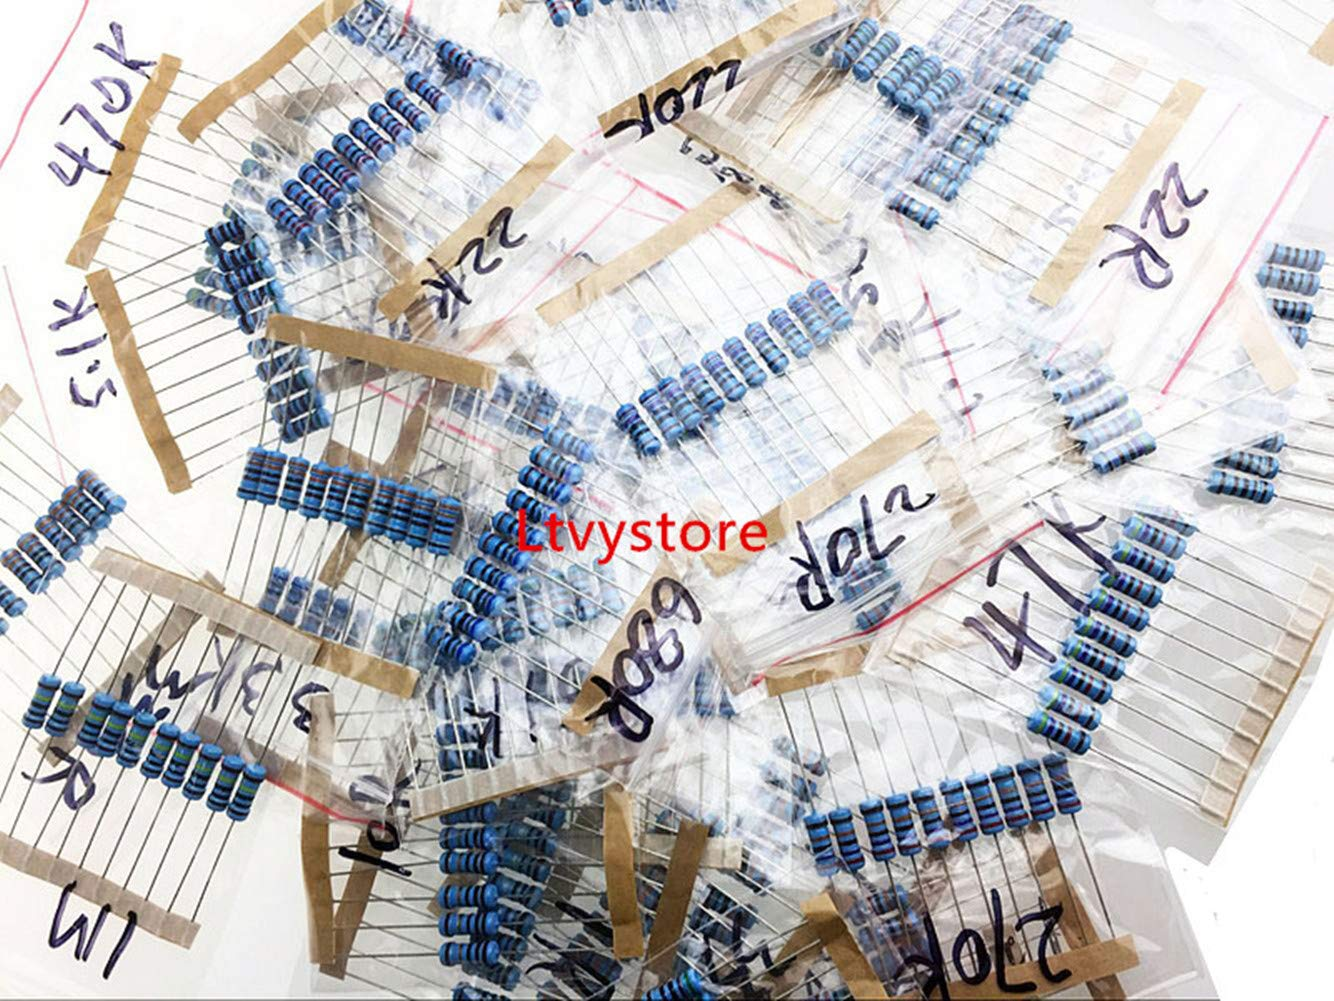 Ltvystore Resistor Box Assortment Metal Film 35 Values 1/% Resistance Resistors Set Arduino Package of 350 1 Ohm 2.2M Ohm Resistor Pack Assorted 1 Watt 1W Resistors Kit